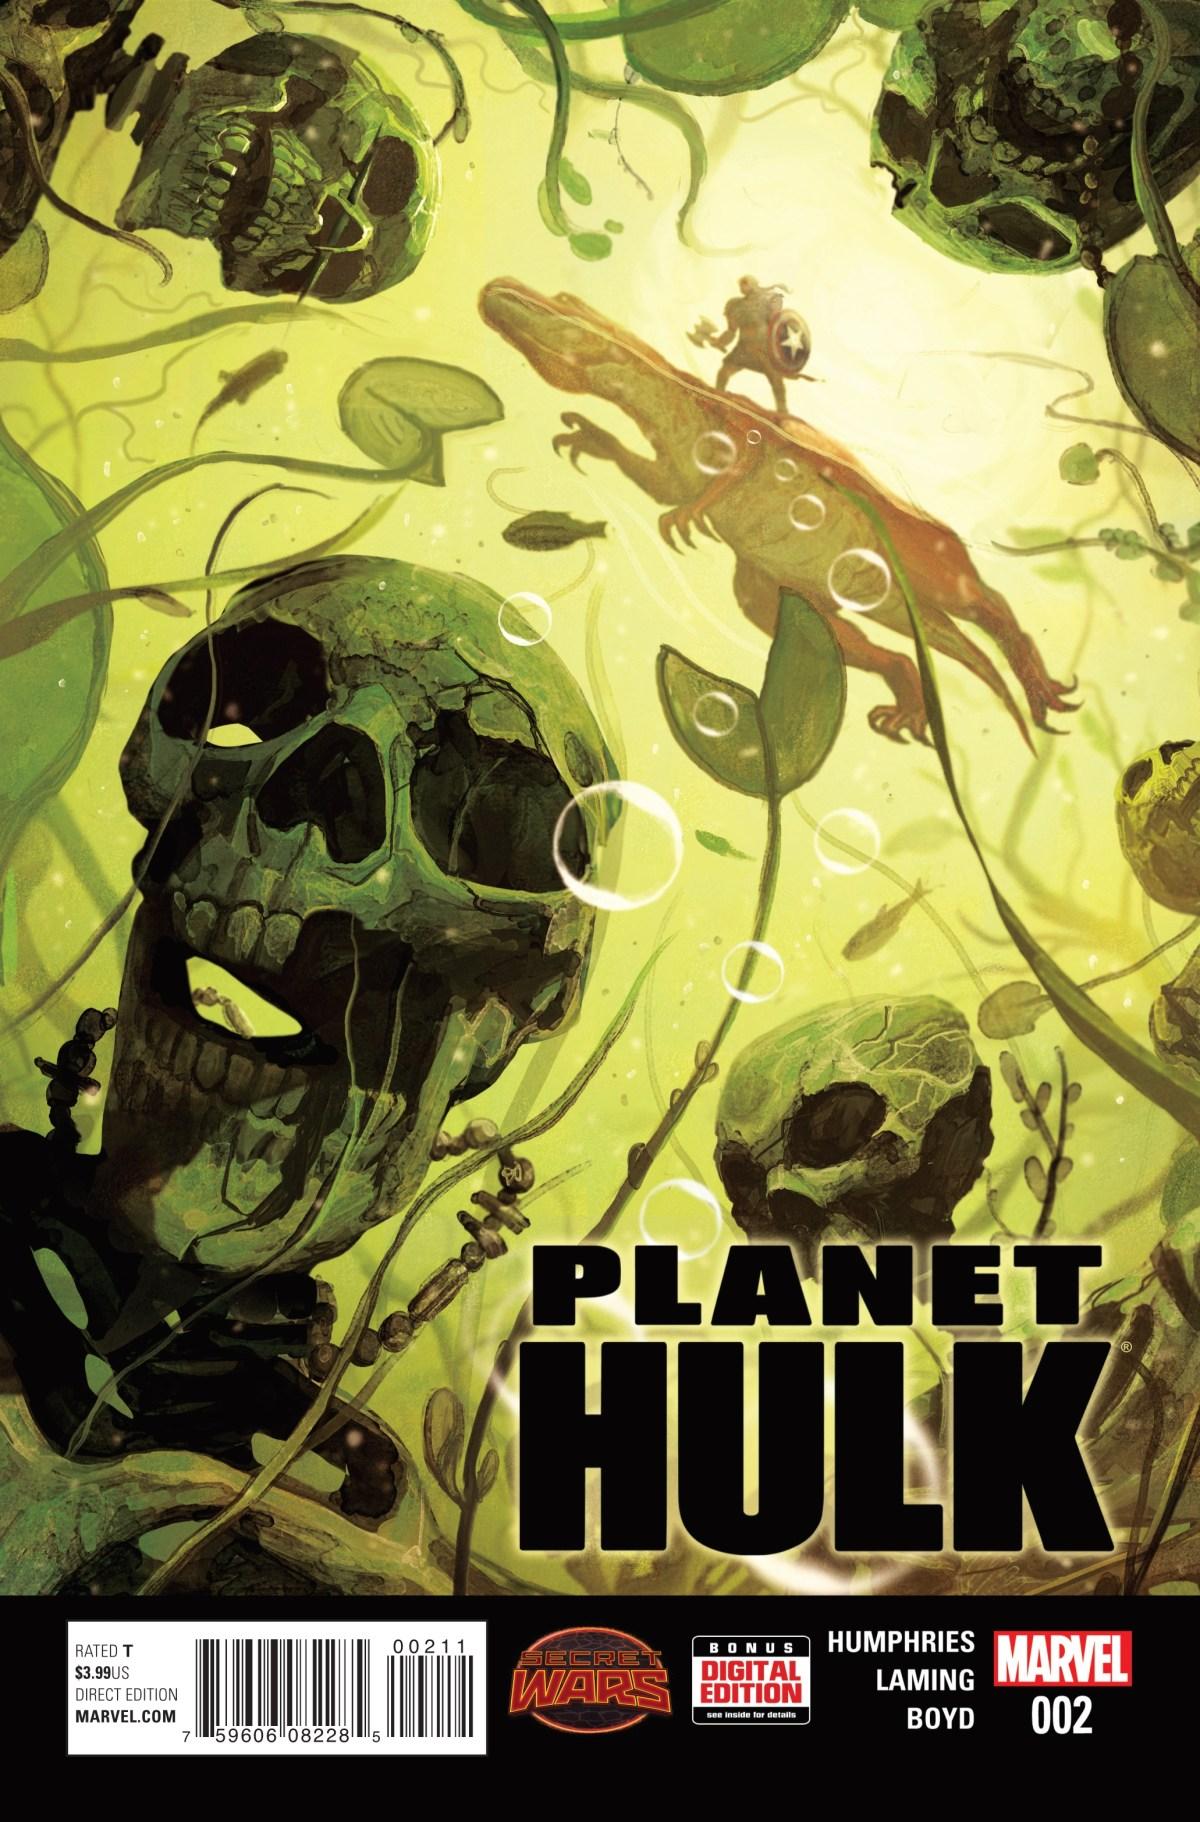 Planet Hulk #2